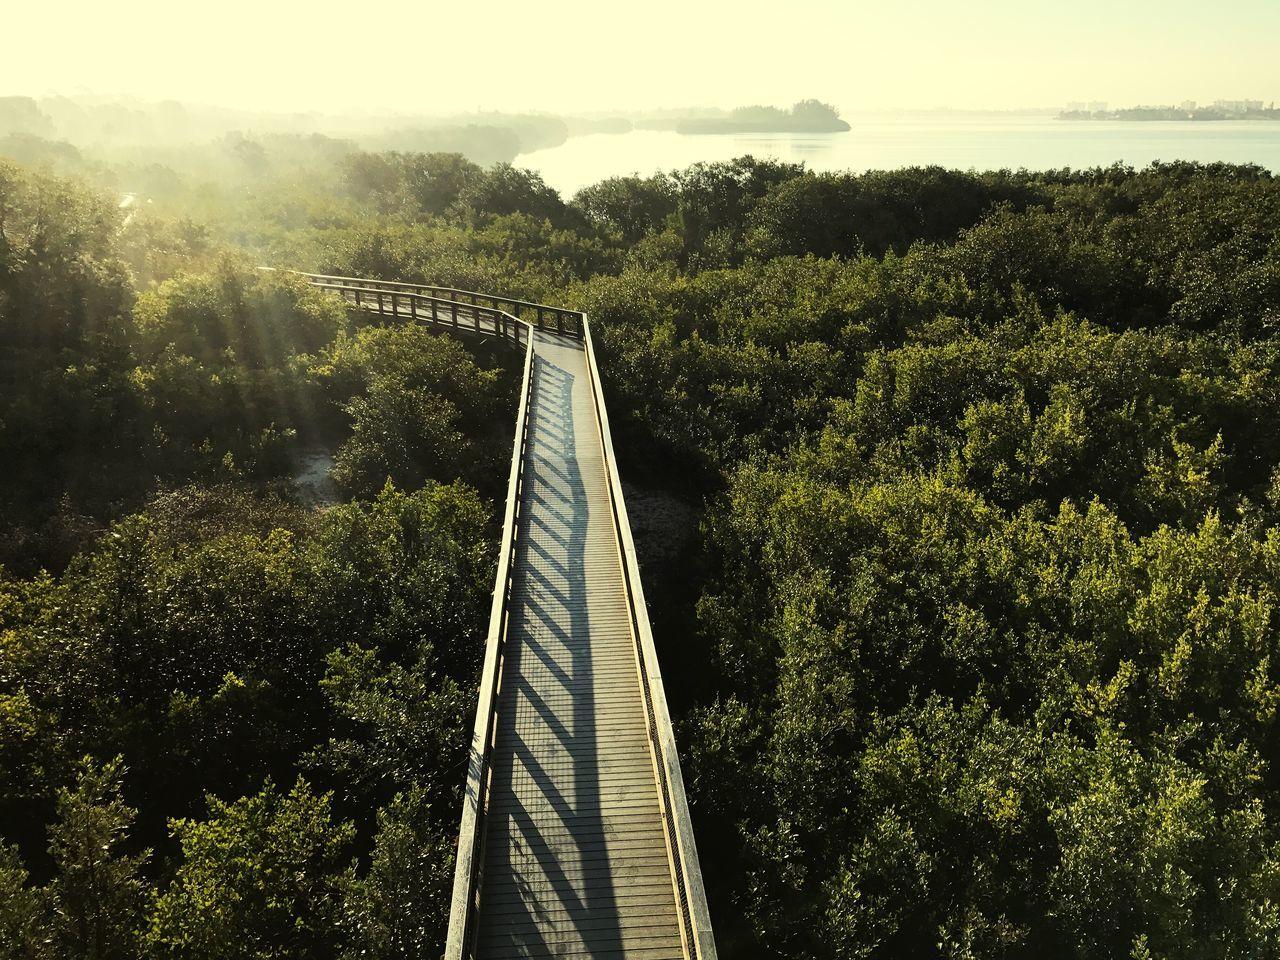 Outdoors Nature Foot Bridge Boardwalk Sun Glare Forest Mangrove Built Structure Landscape Bay Sunrise The City Light